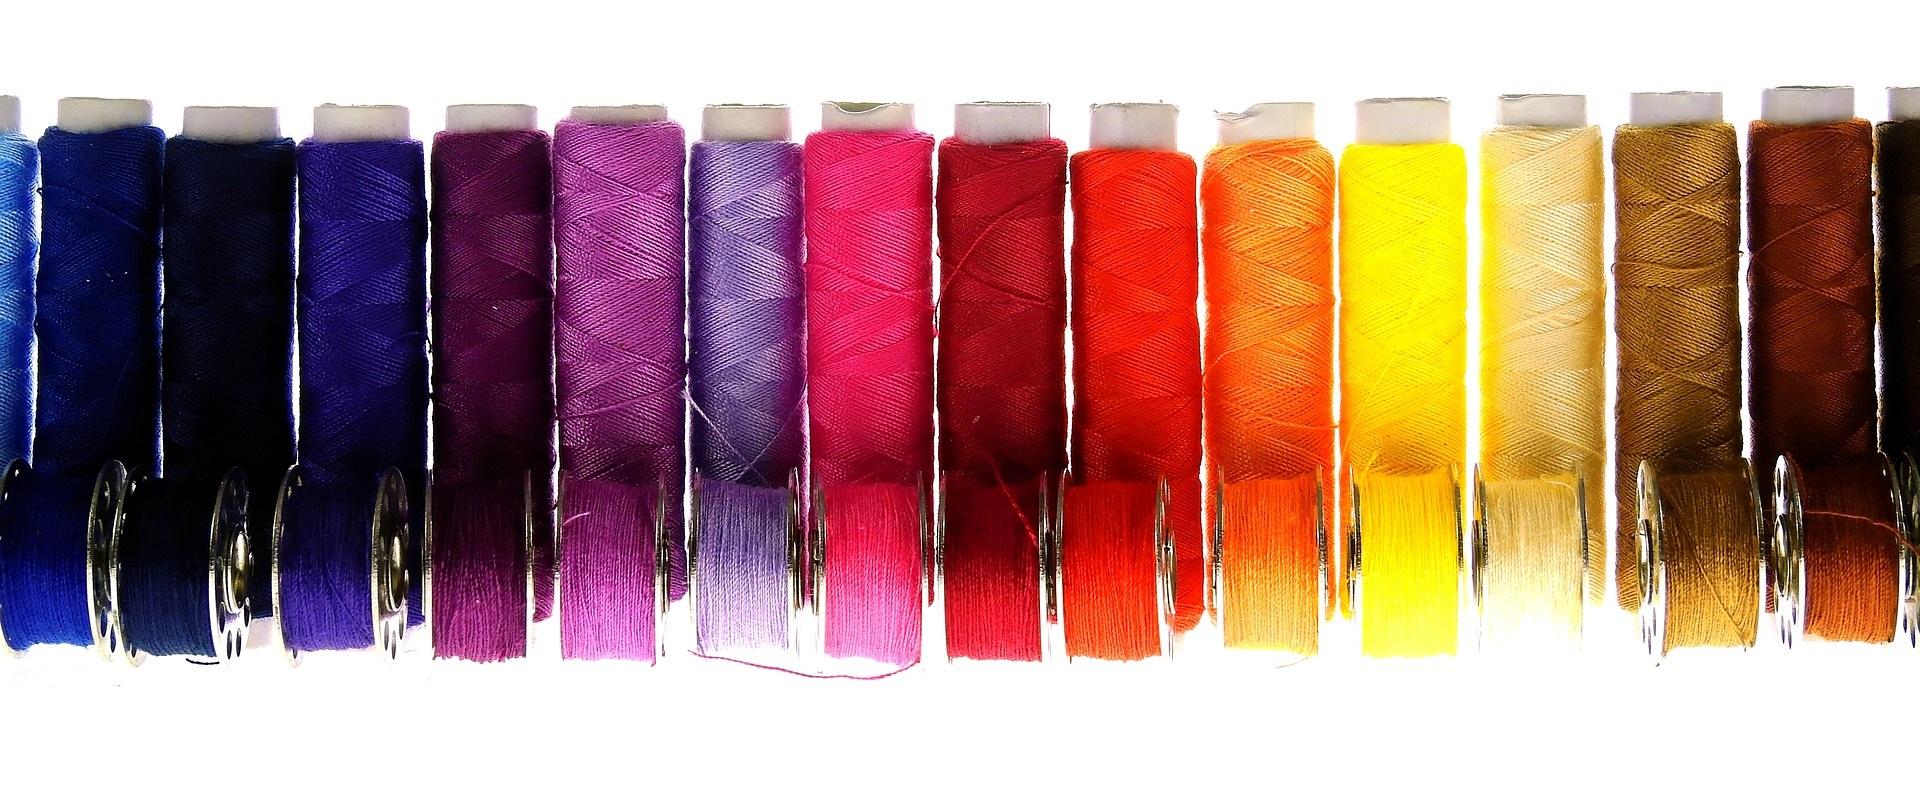 yarn-1615493_1920